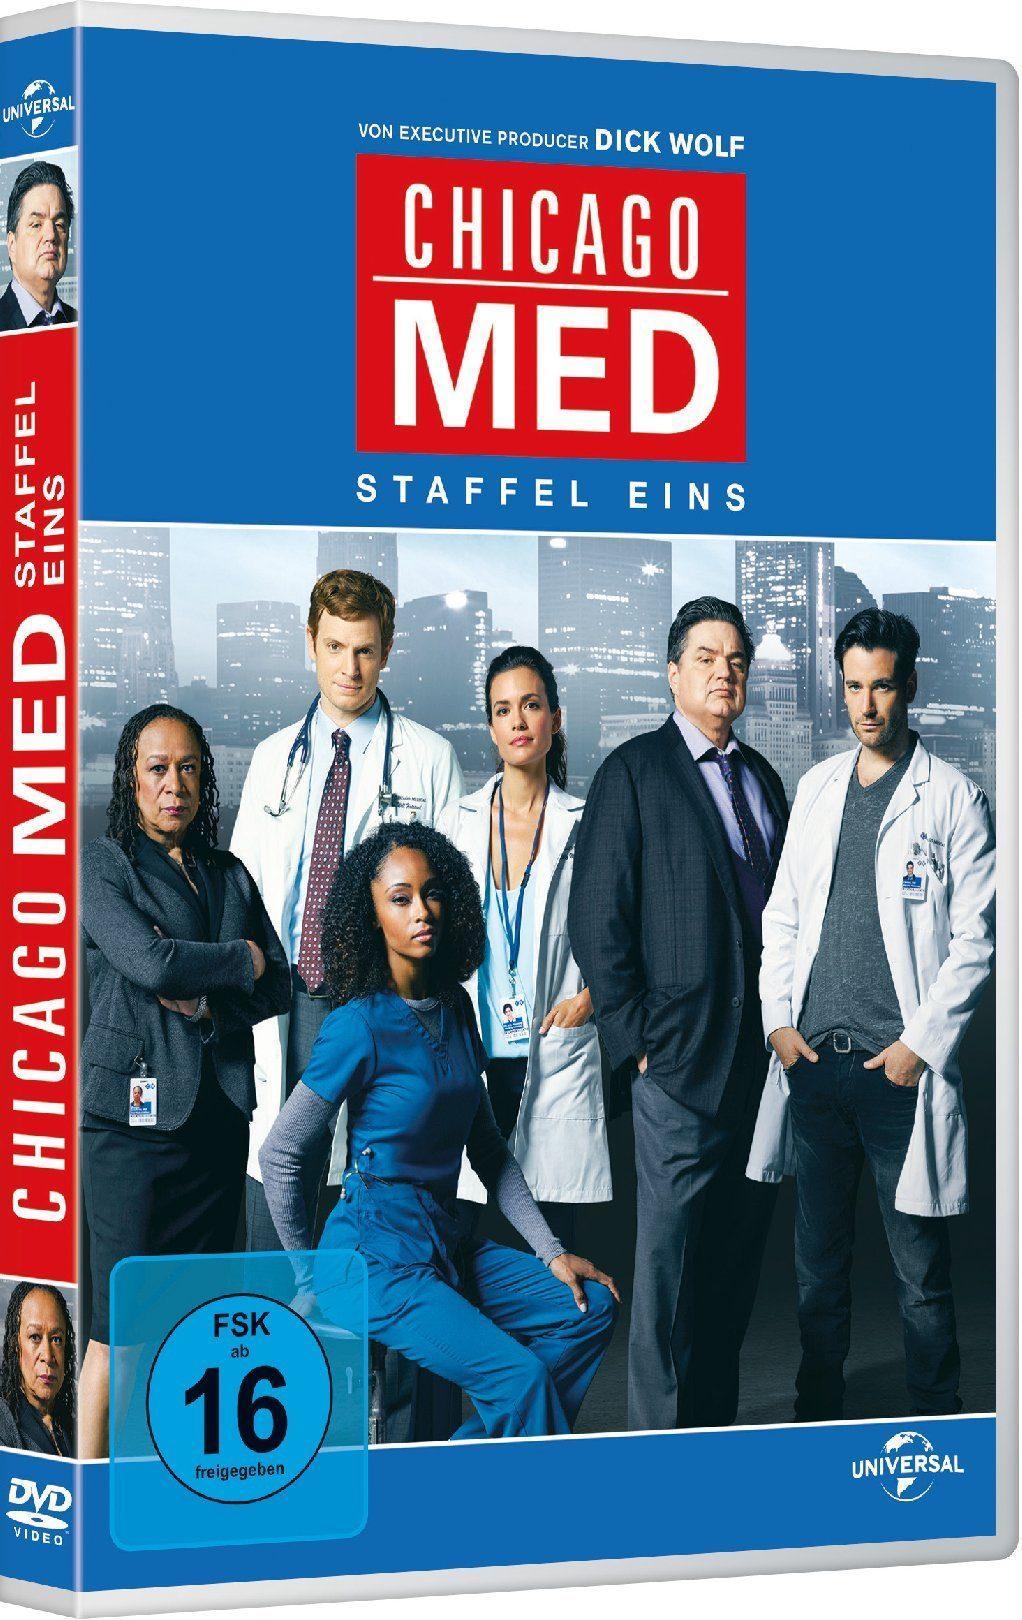 Universal Chicago Med - Staffel 1 »DVD«